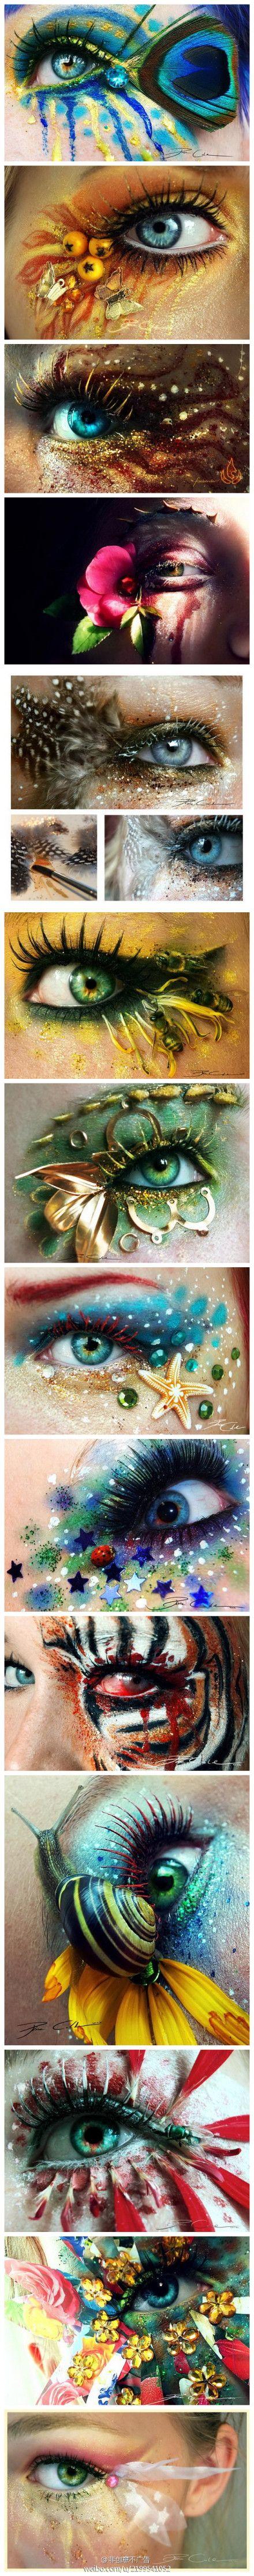 Astonishing eye make up by Svenja Jödicke I wish I could do this..♥